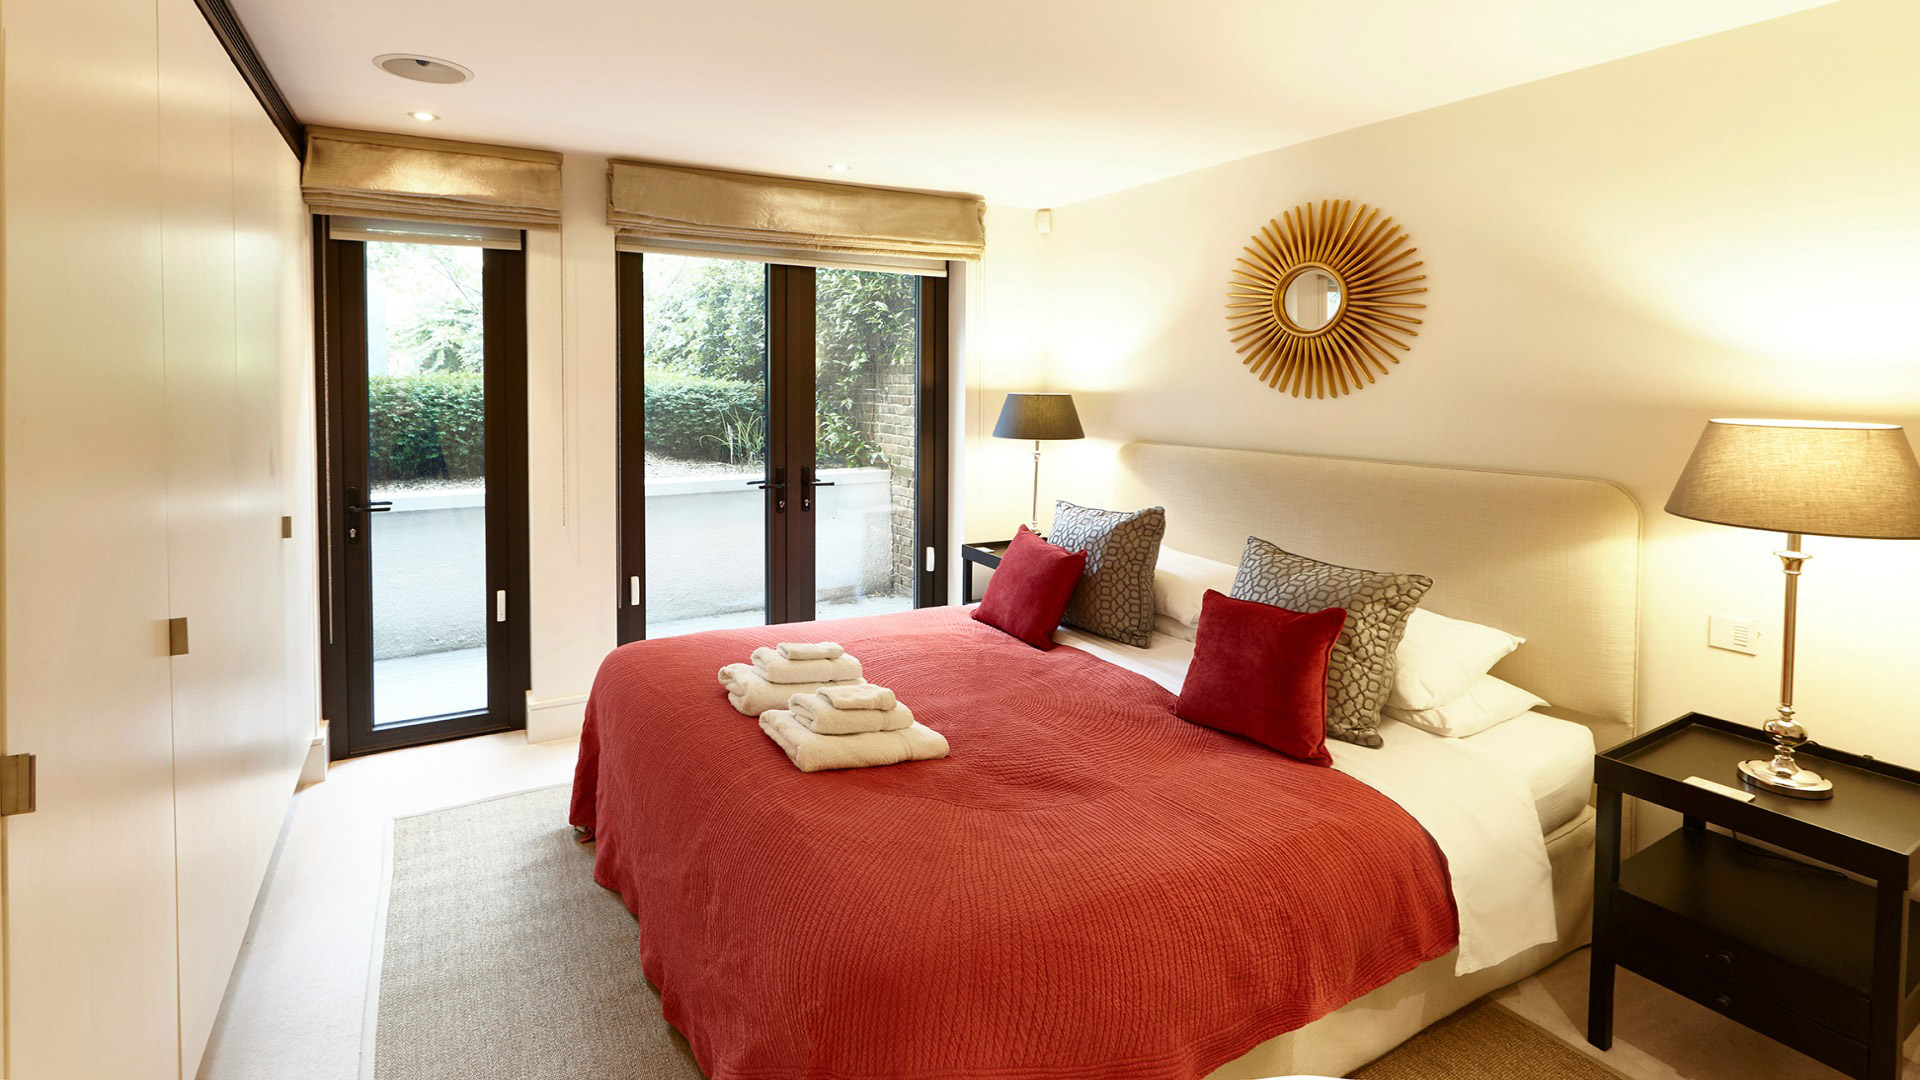 2 Bedroom, 2 Bathroom Vacation Apartment in Chelsea, London